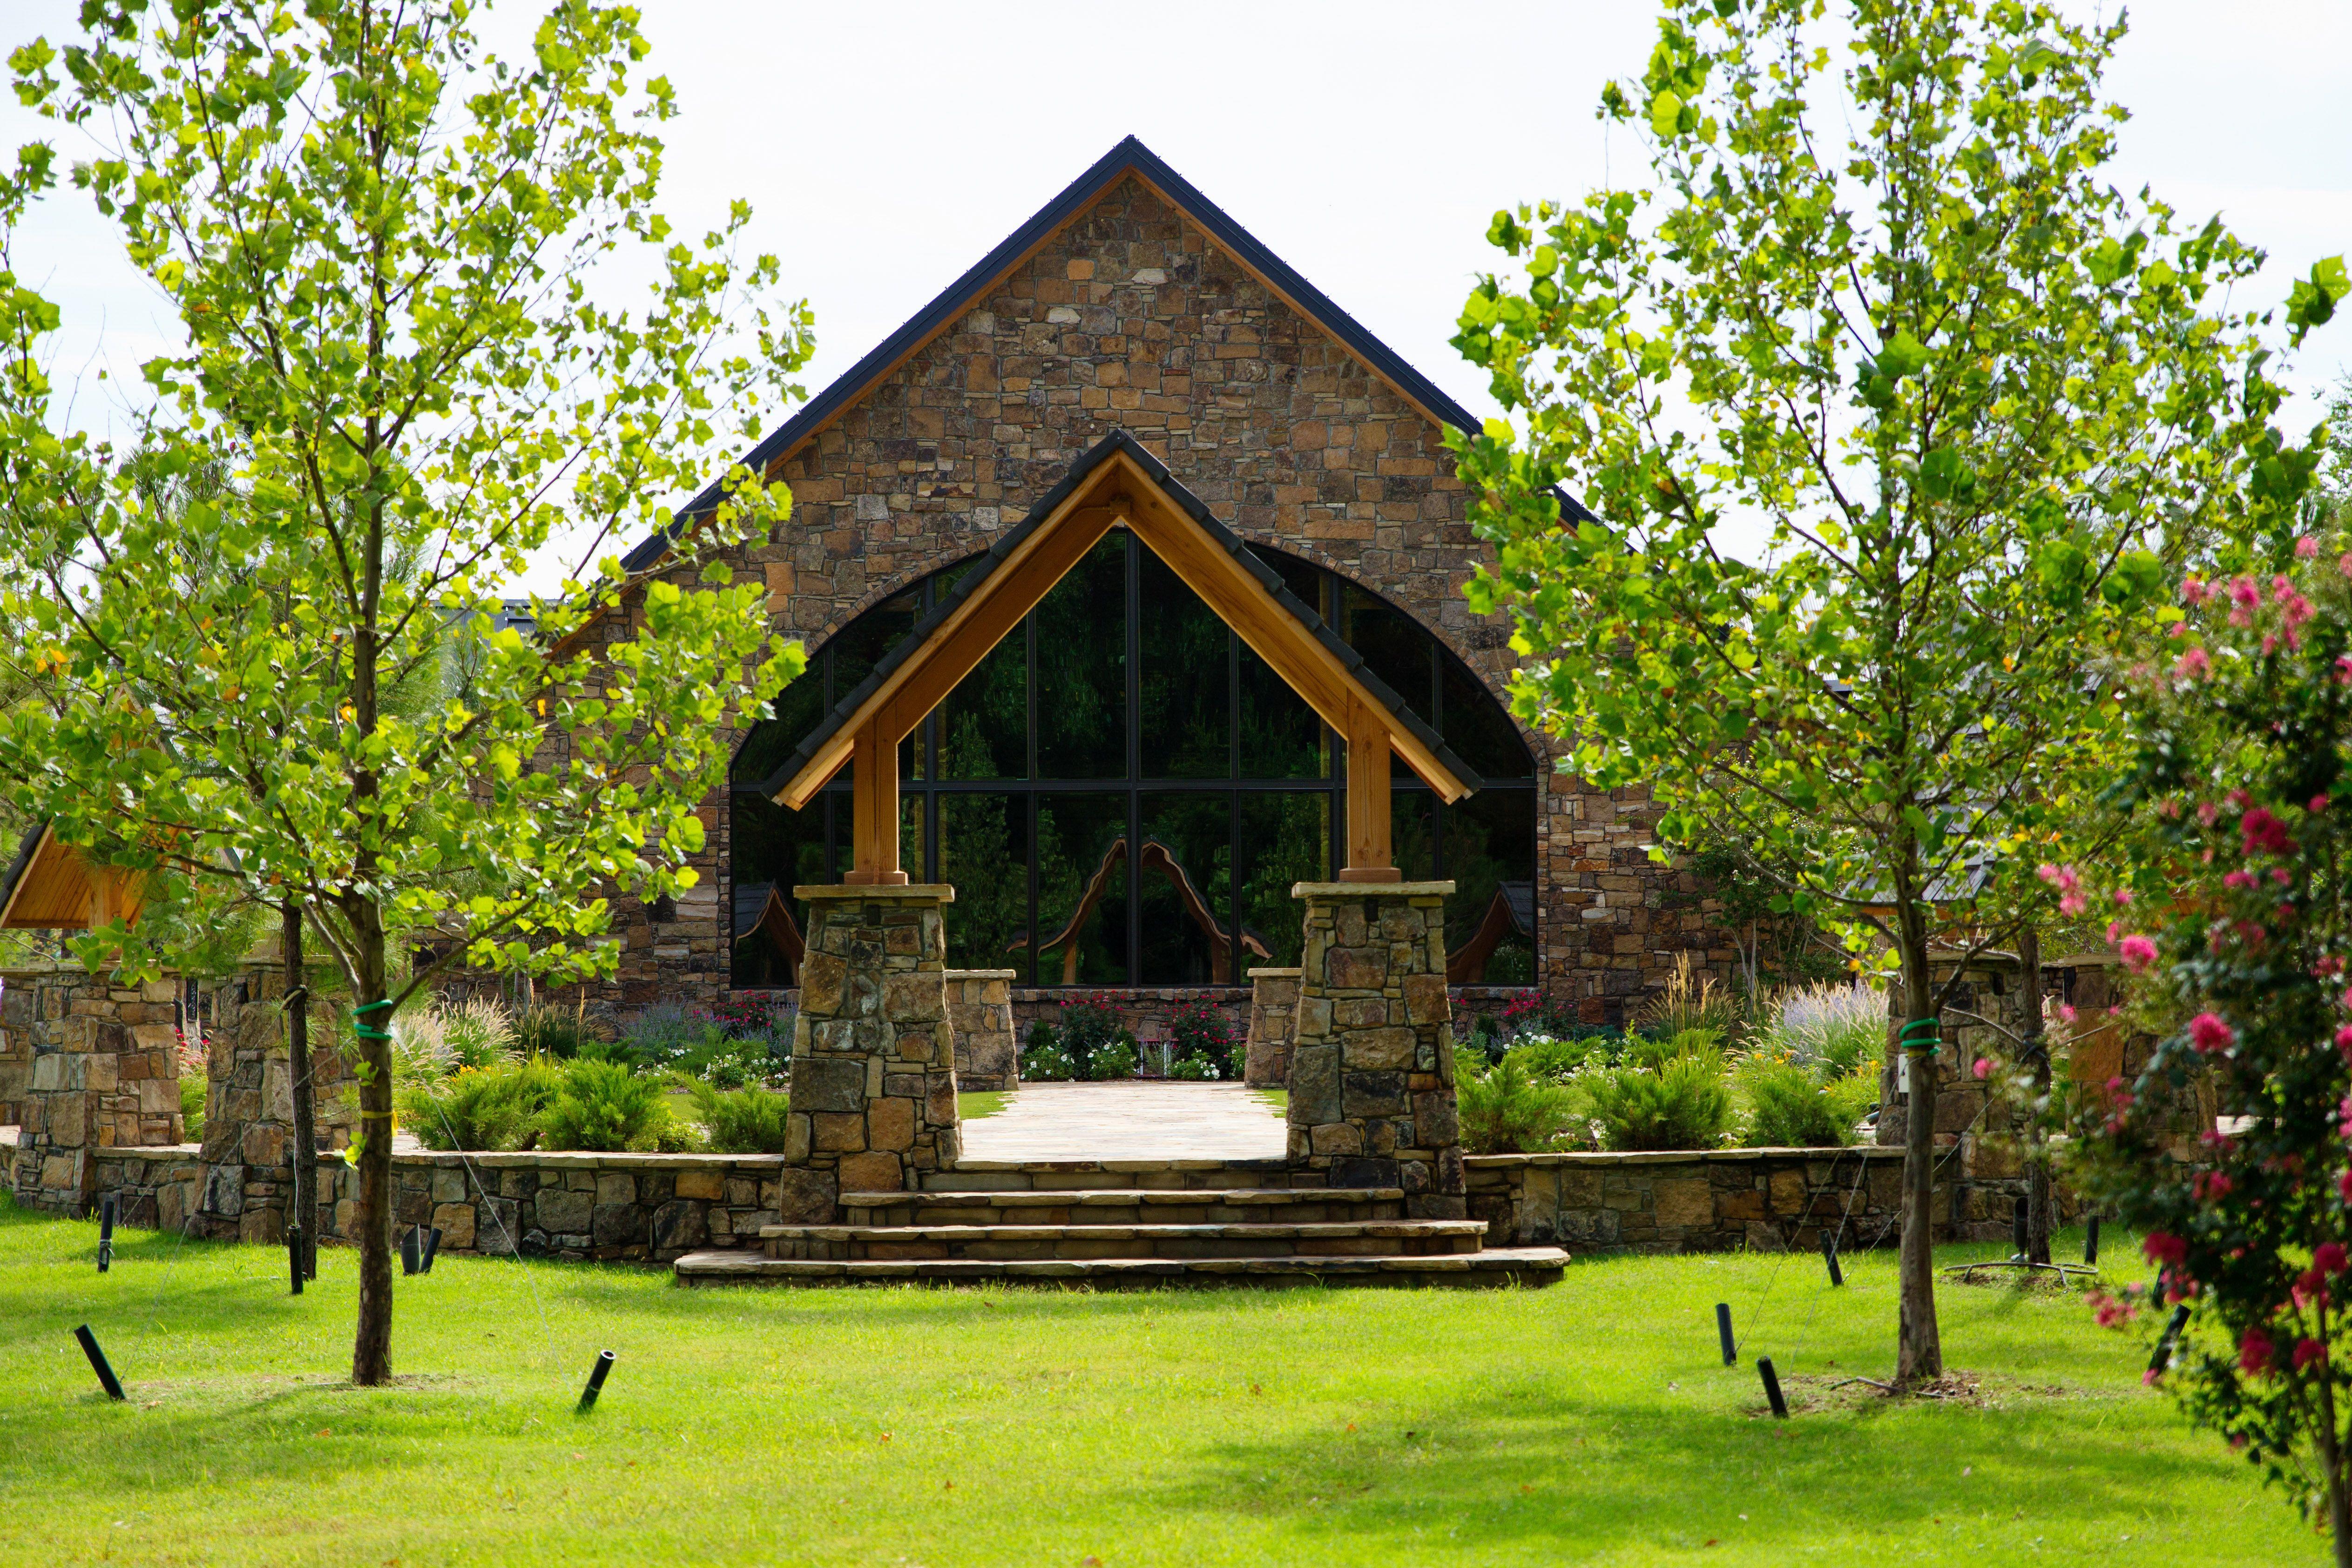 The Chapel Heartland Place 81 Ranch Enid Oklahoma Photo Courtesy Of Hawk Photography